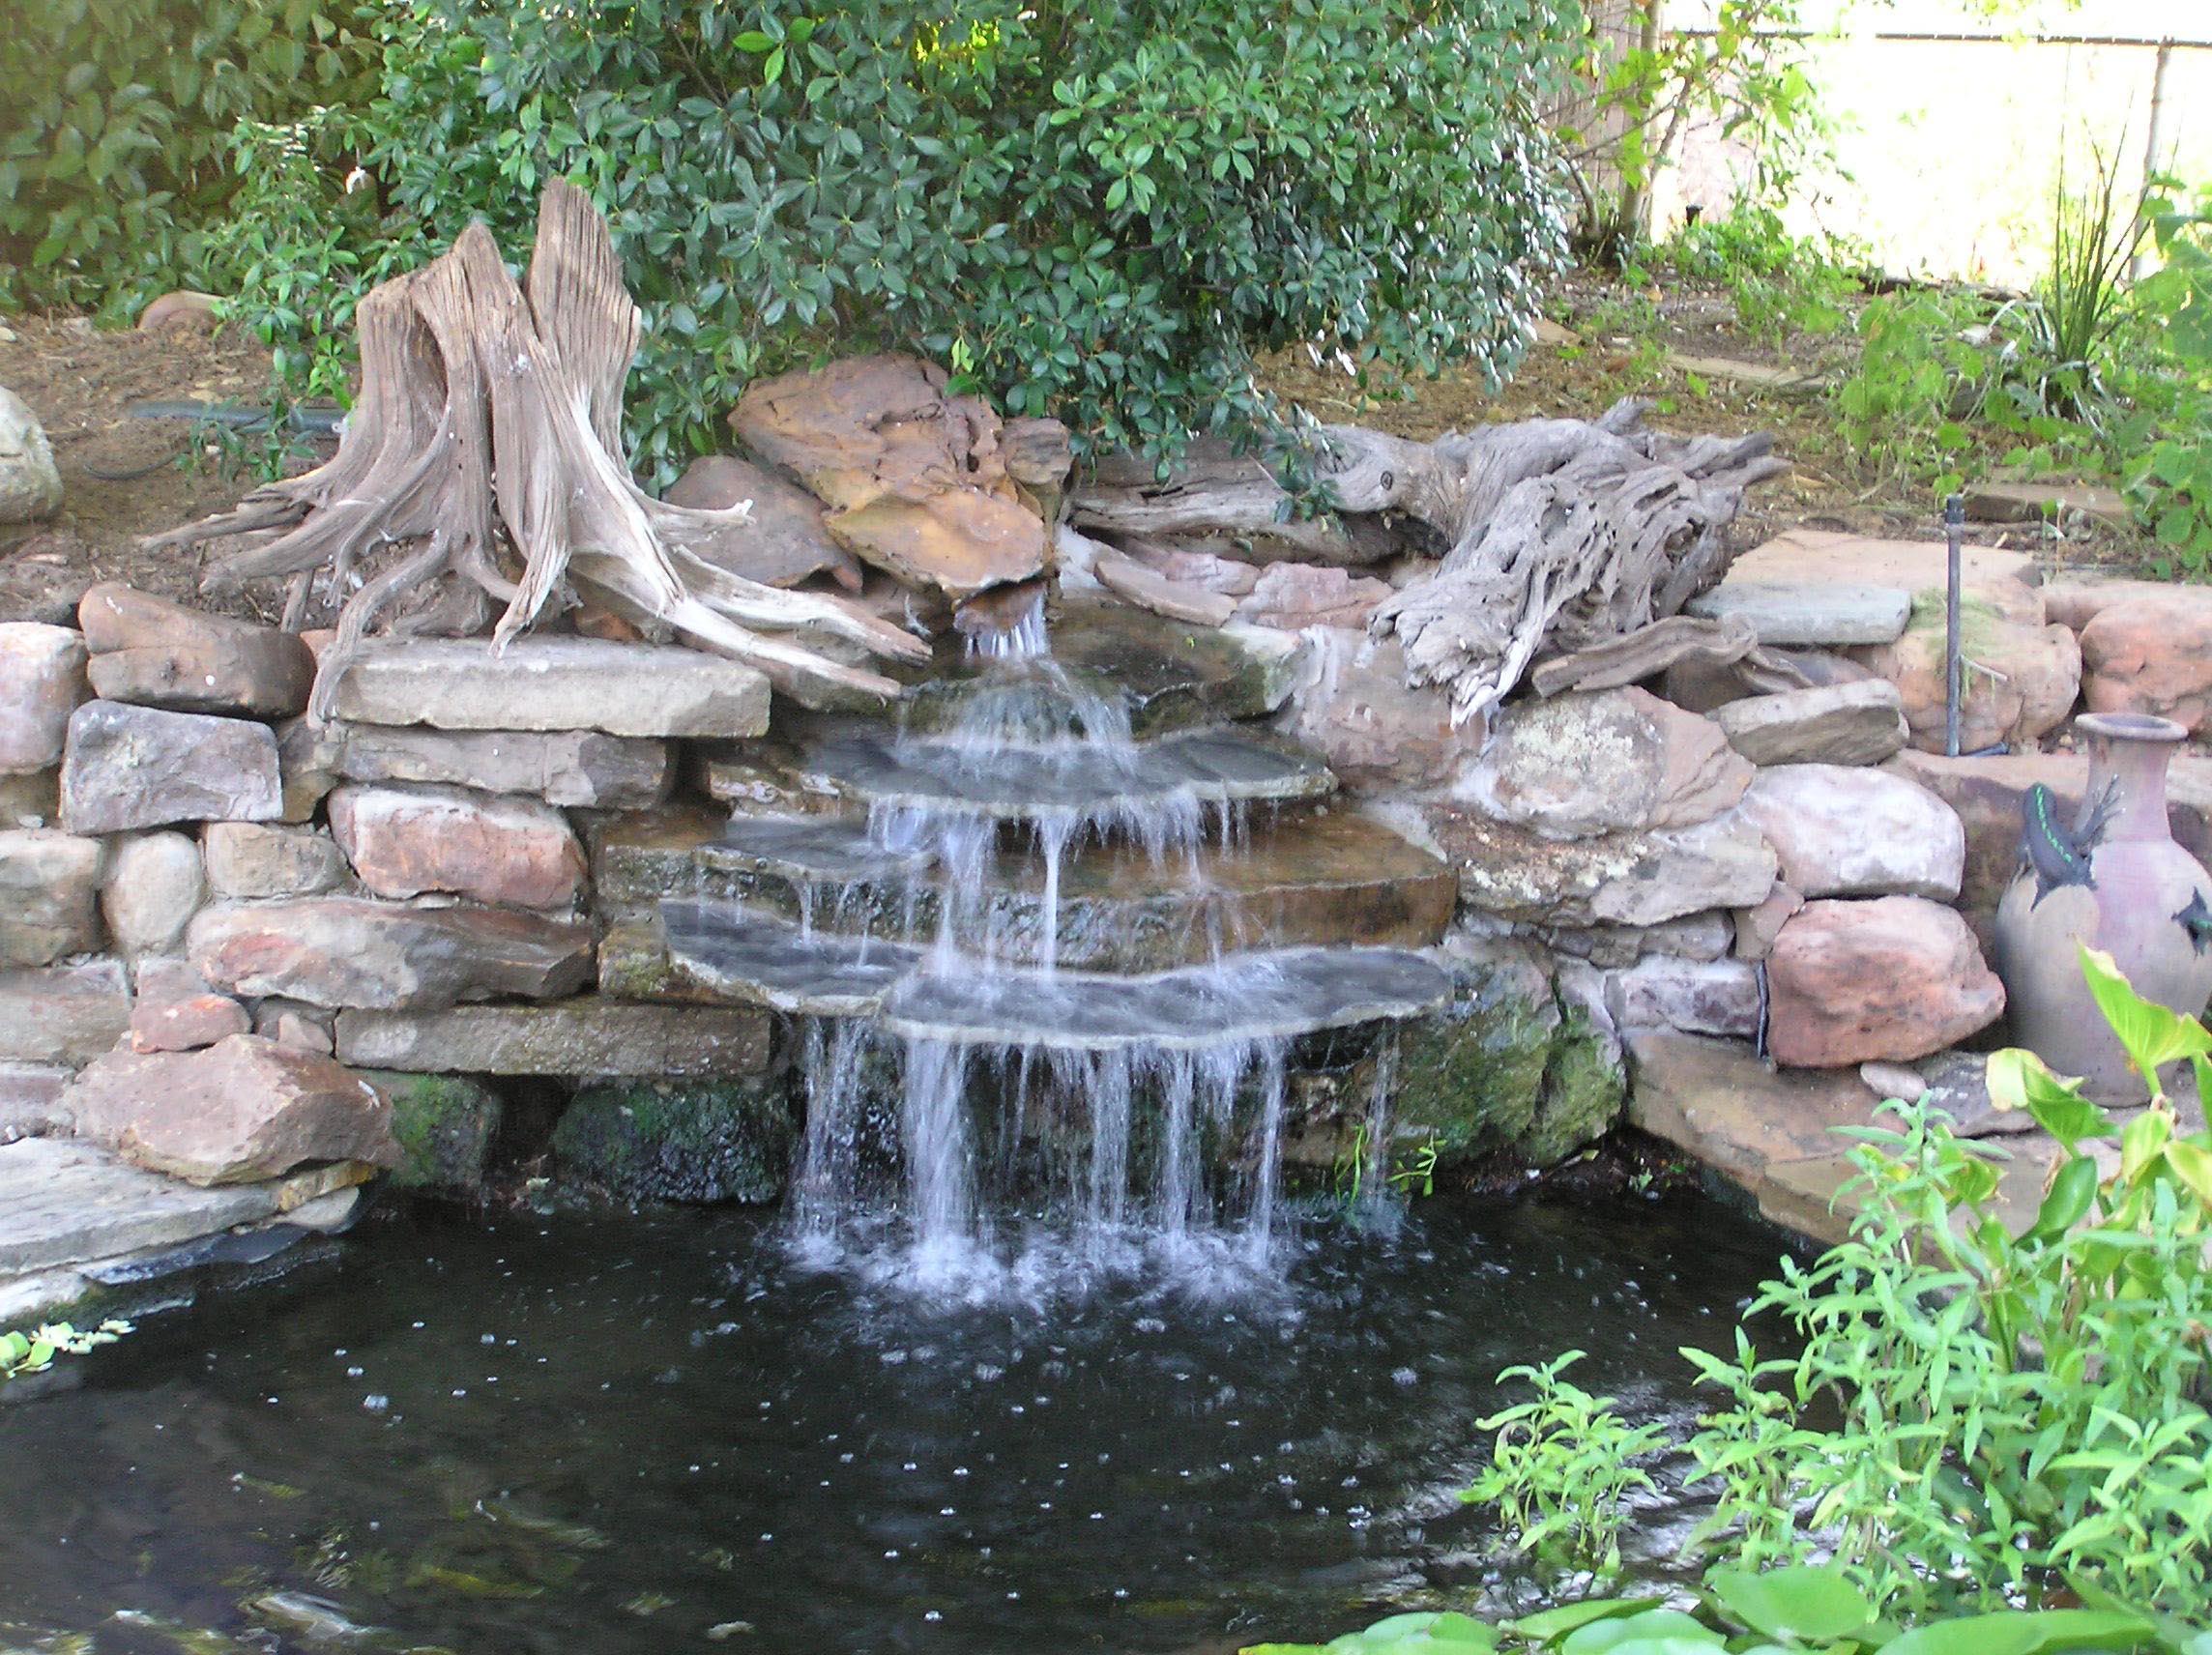 Garden Pond Waterfall Designs | Backyard Design Ideas on Small Backyard Pond With Waterfall  id=45051